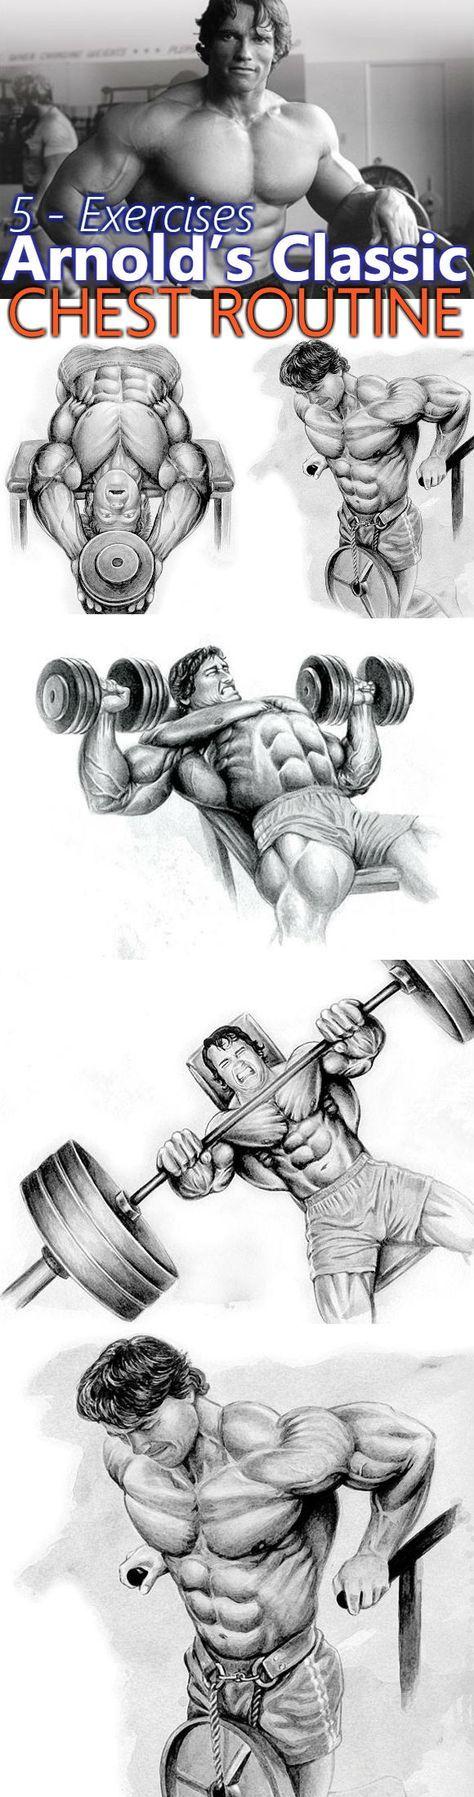 5 Exercises Chest Routine